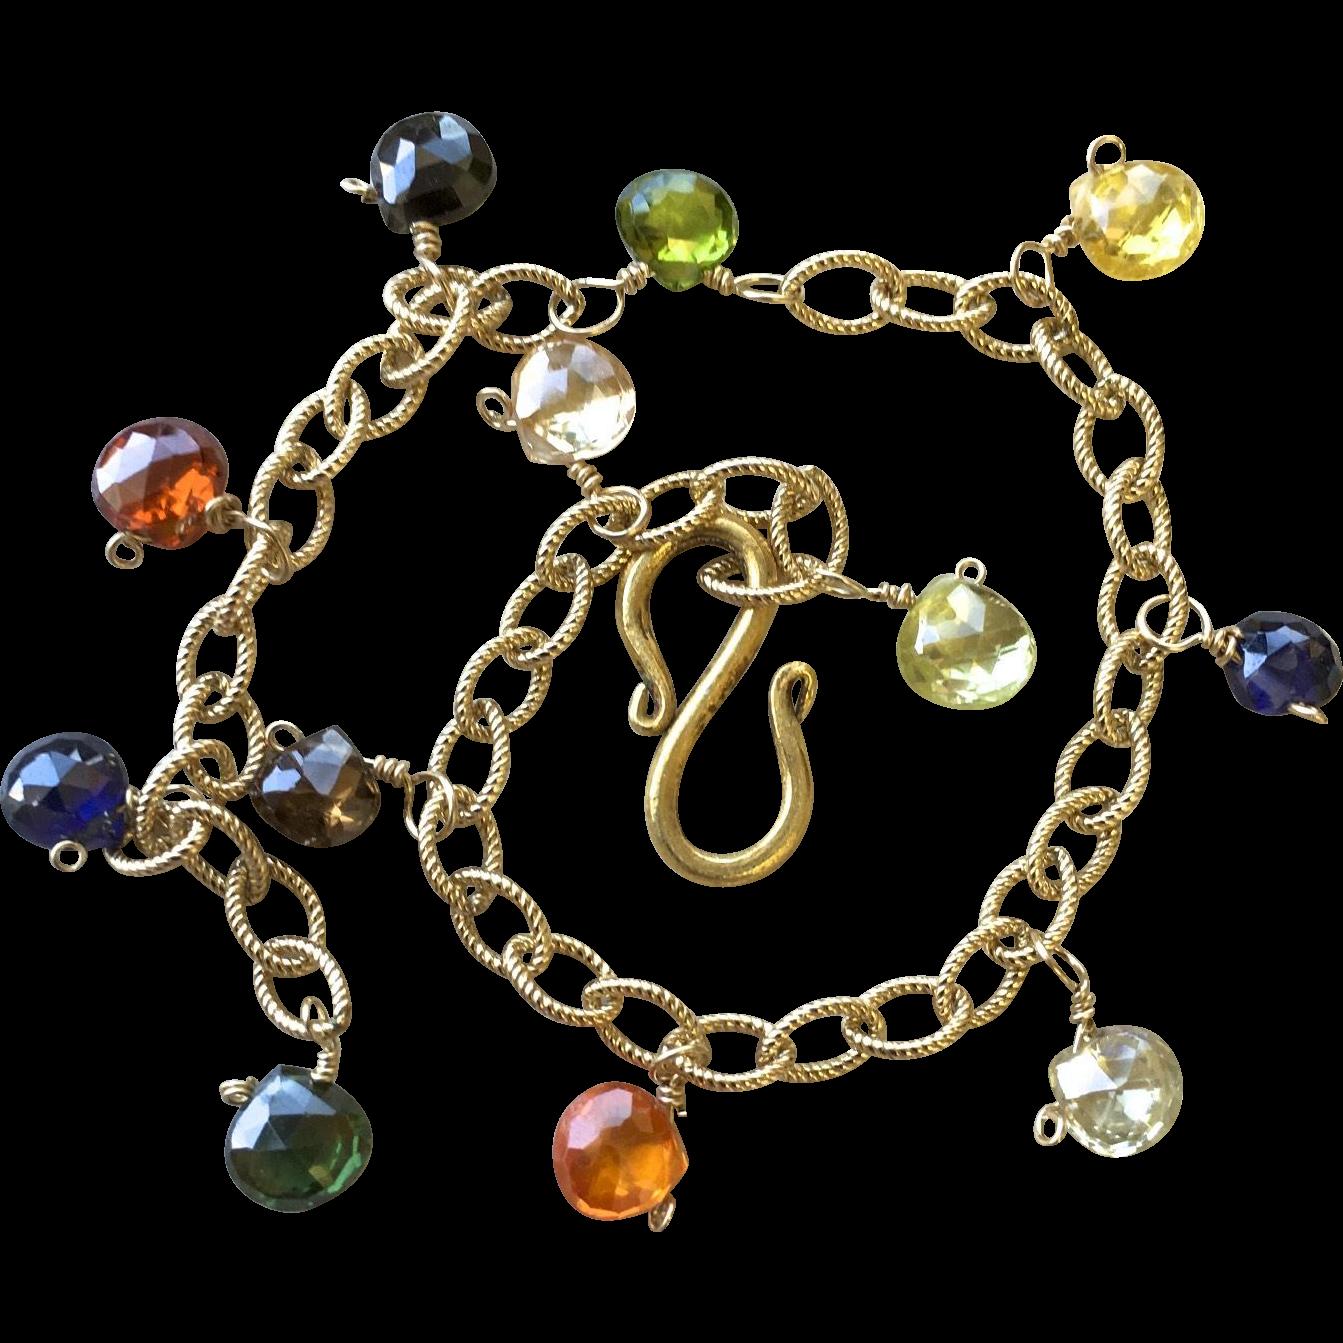 rainbow charm bracelet 14k gold filled cz charms c